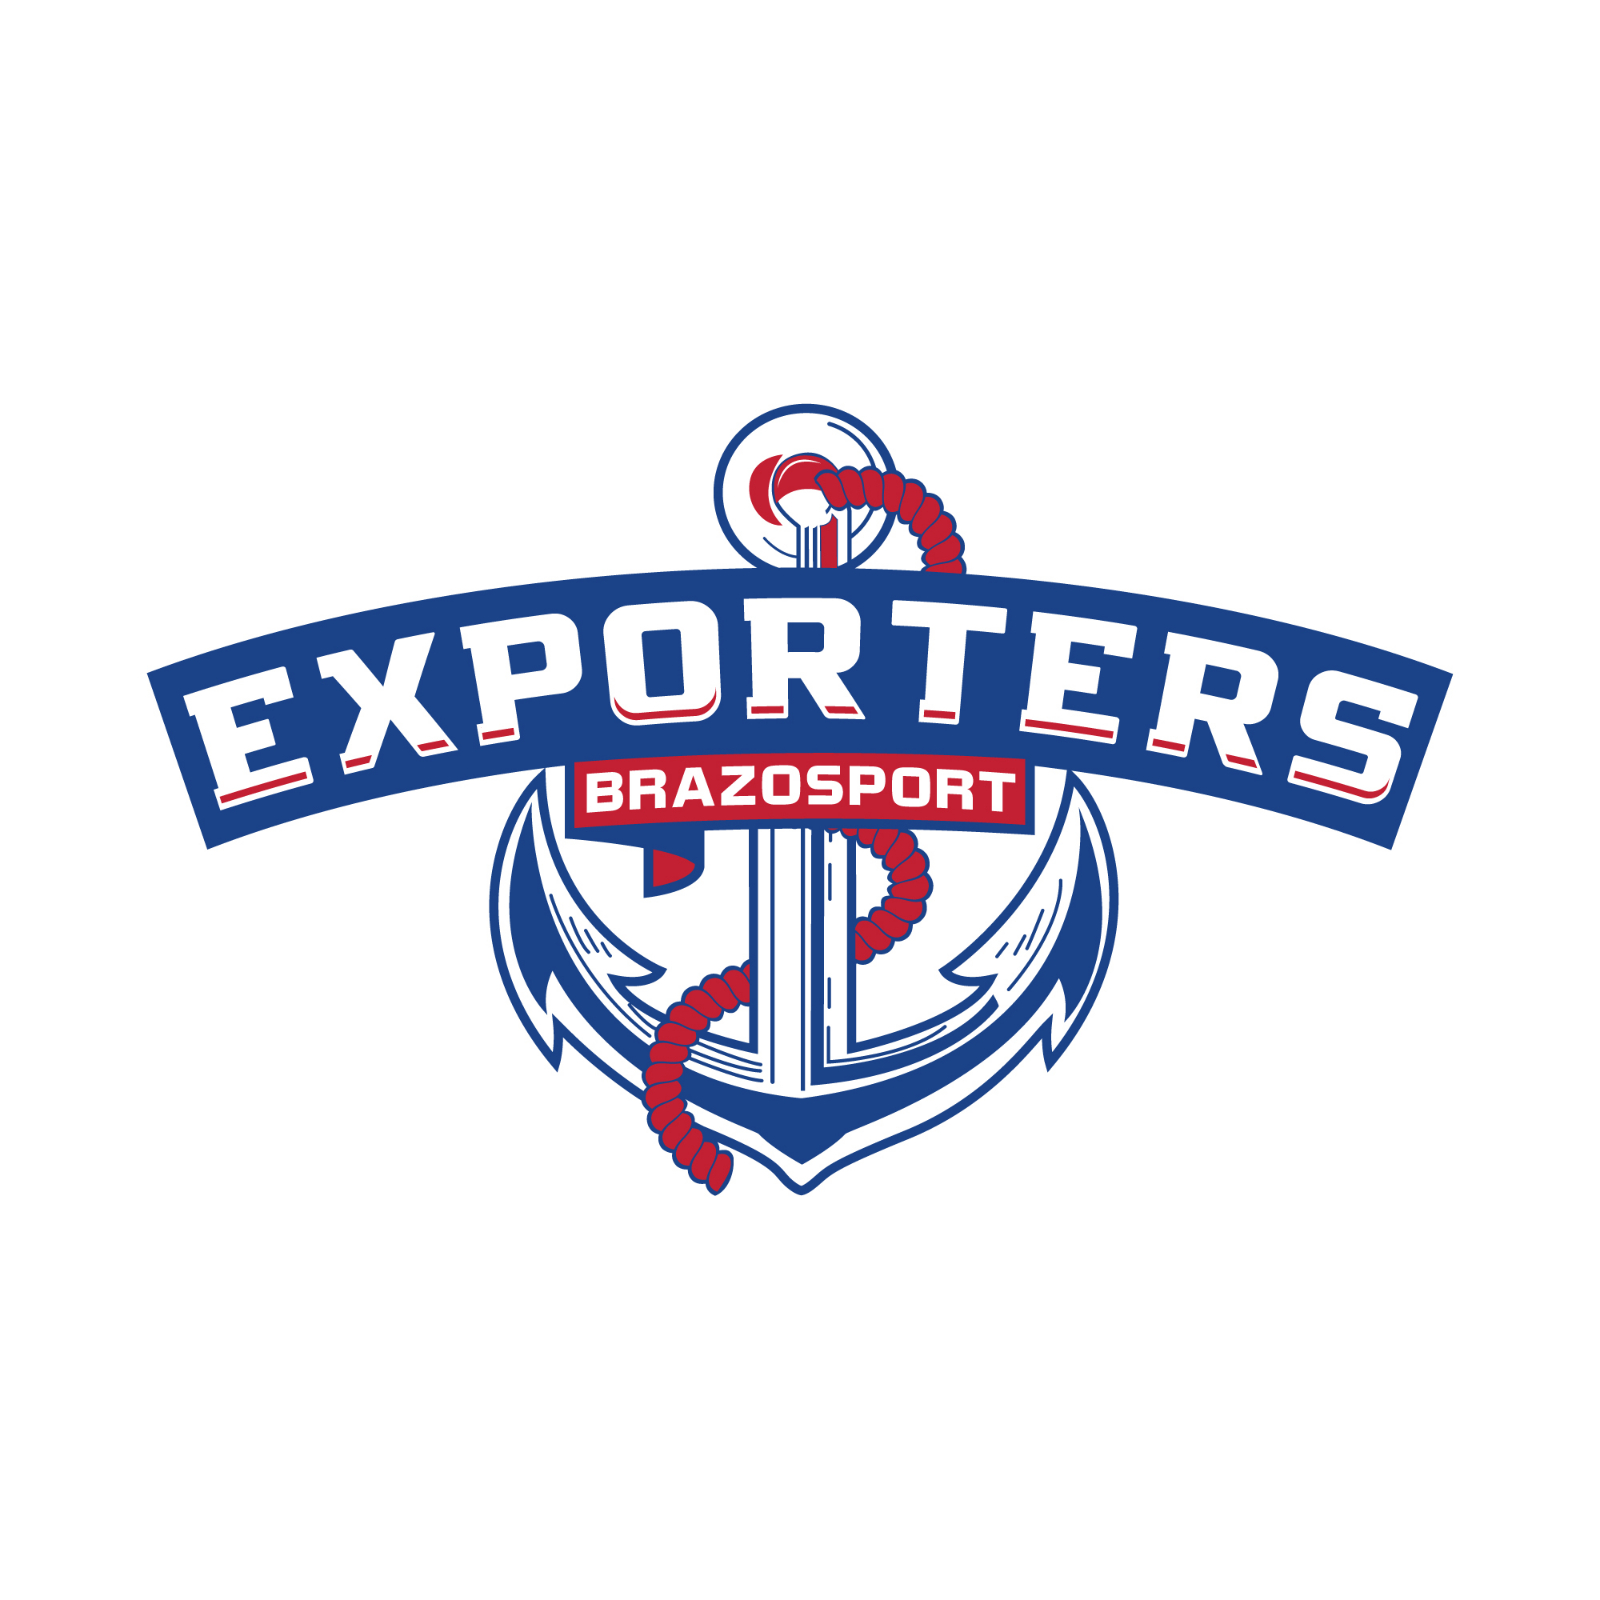 Lady Exporters Sweep Tidehaven